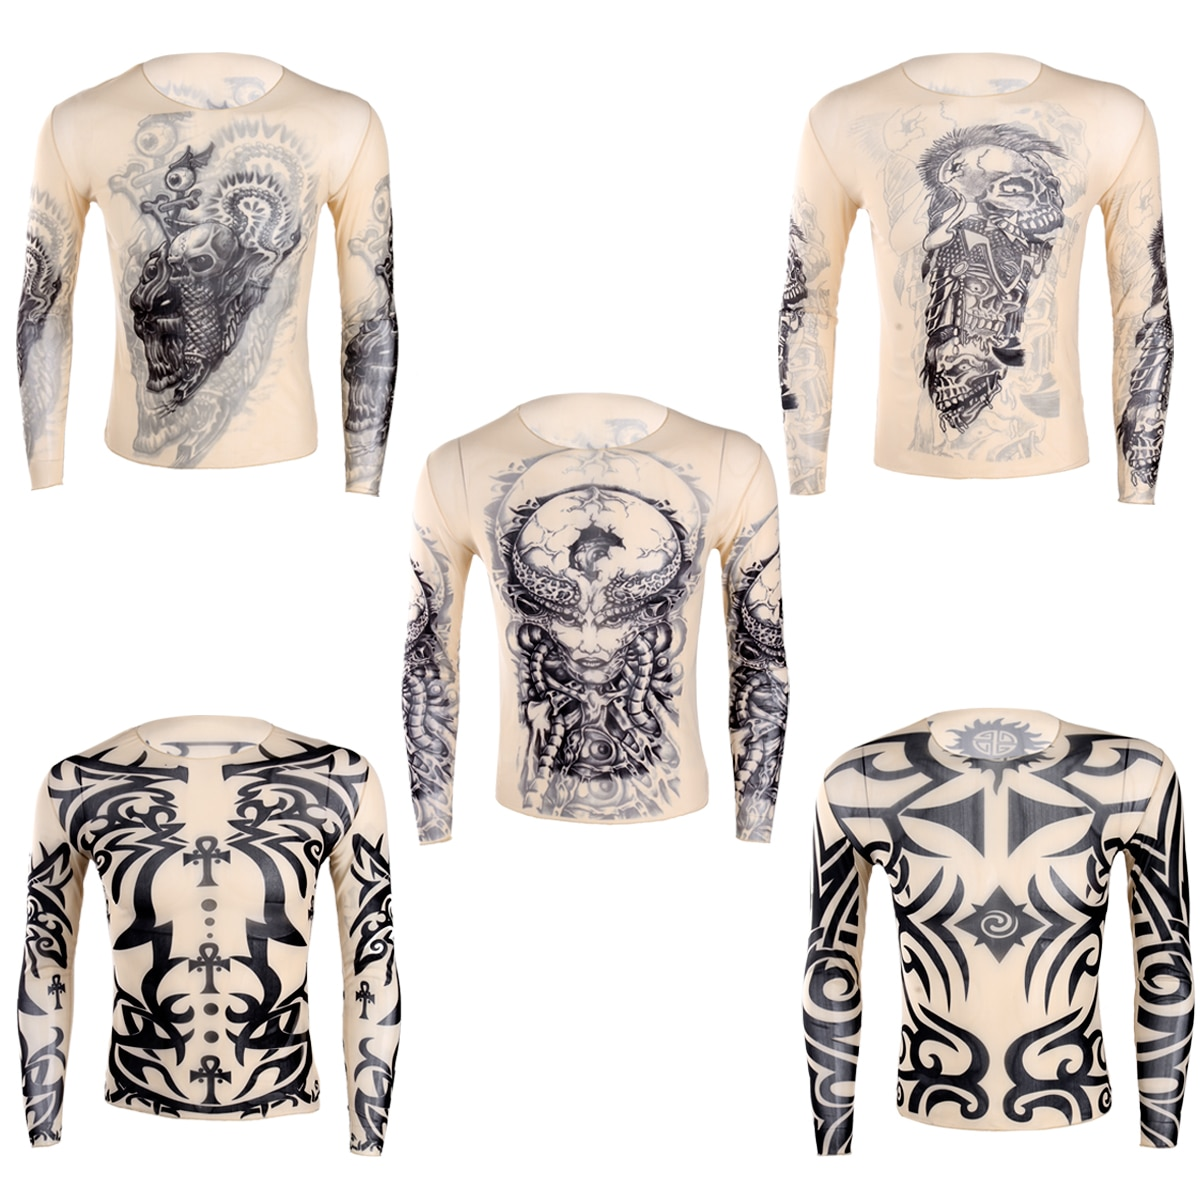 IEFiEL, Otoño, camisetas para hombres, tatuaje falso elástico transparente, camiseta de manga larga para culturismo para hombres, ropa de aspecto húmedo de Halloween